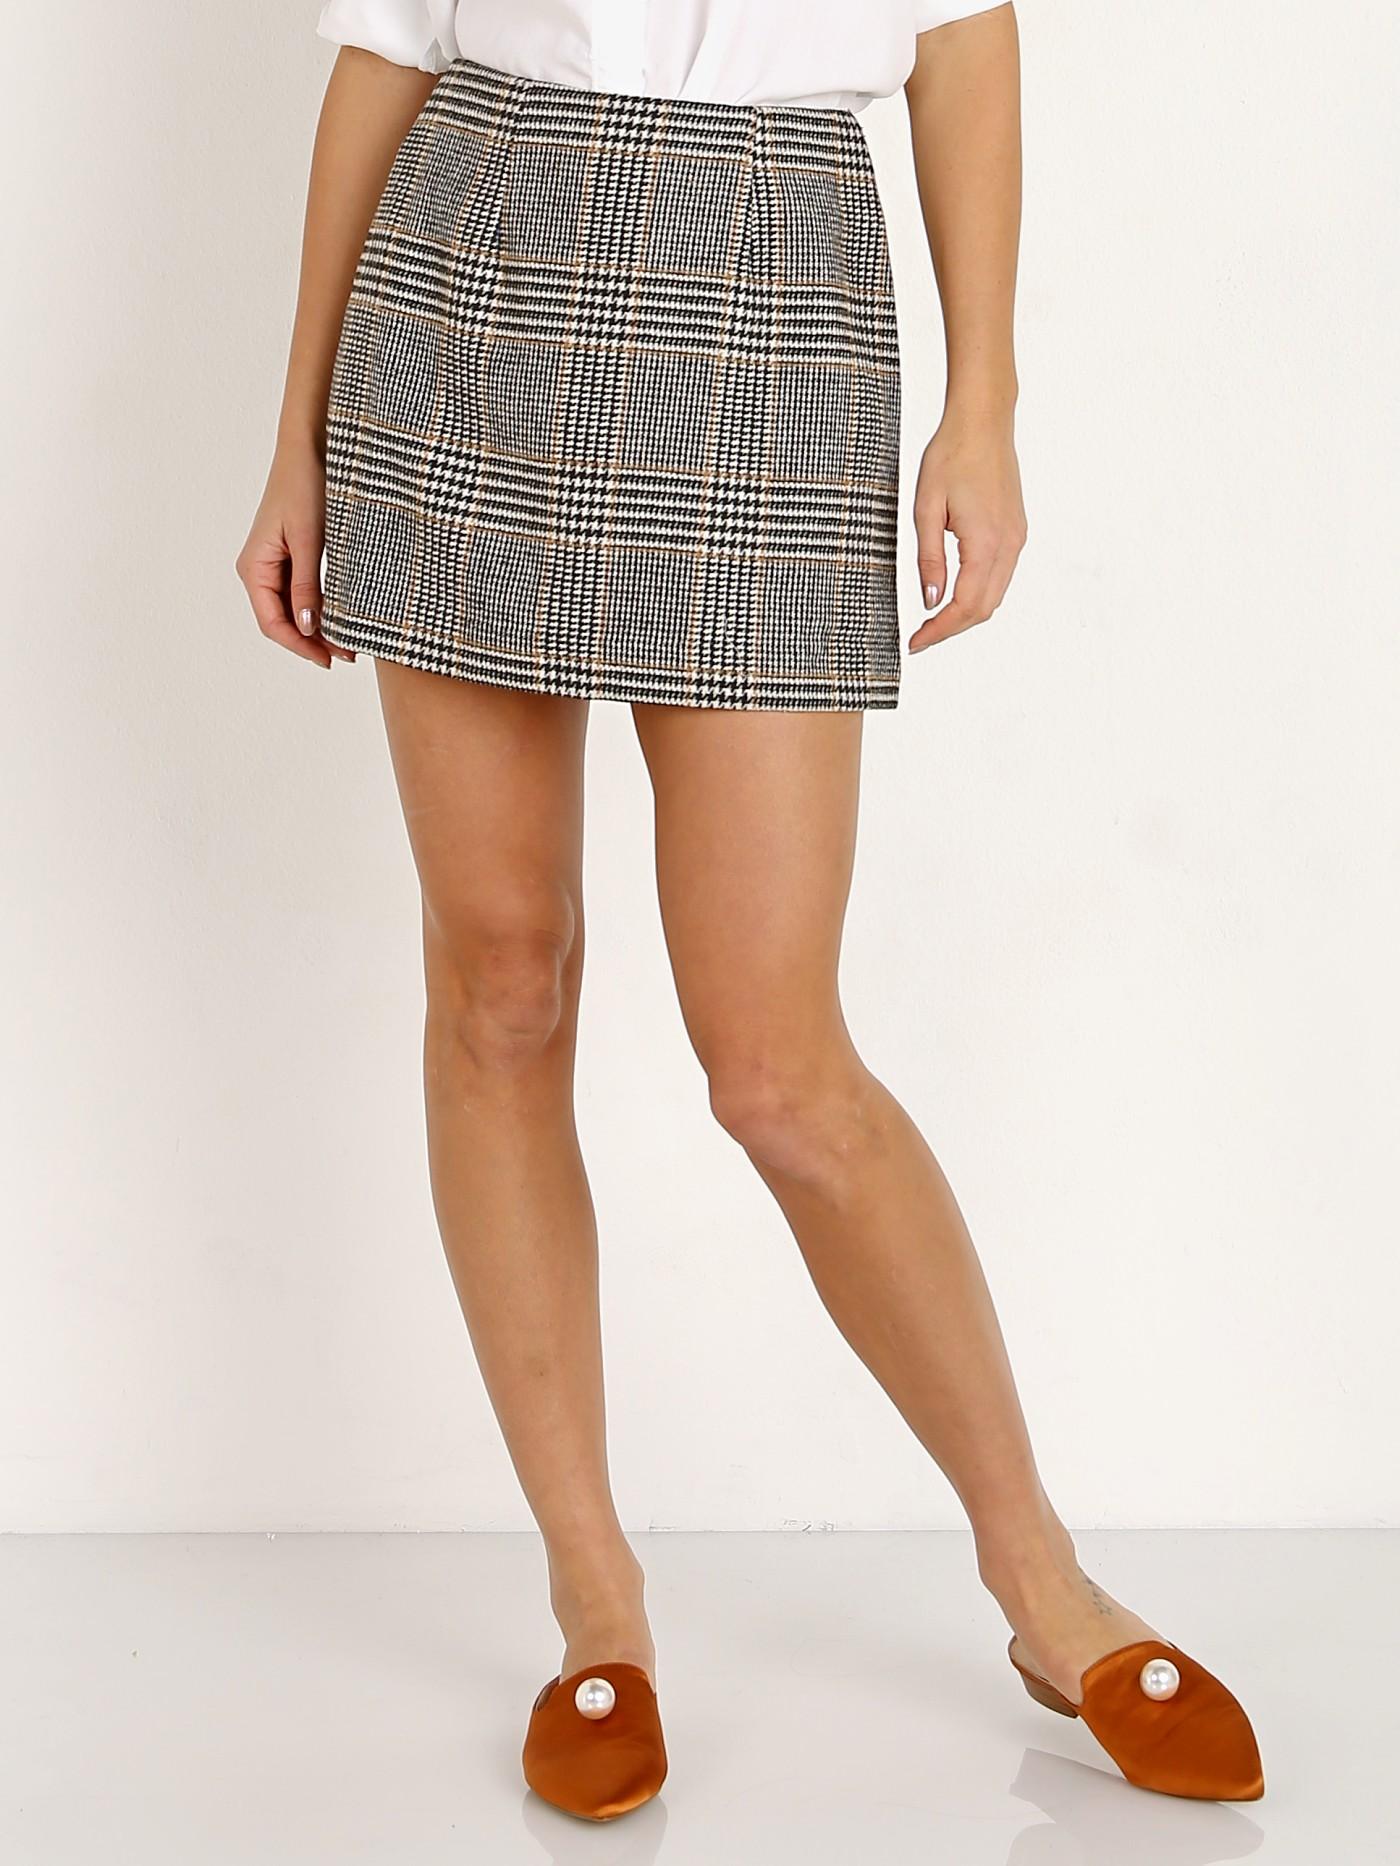 1924567a0 ASTR the Label Raye Skirt Black Plaid ACS9001 - Free Shipping at Largo Drive